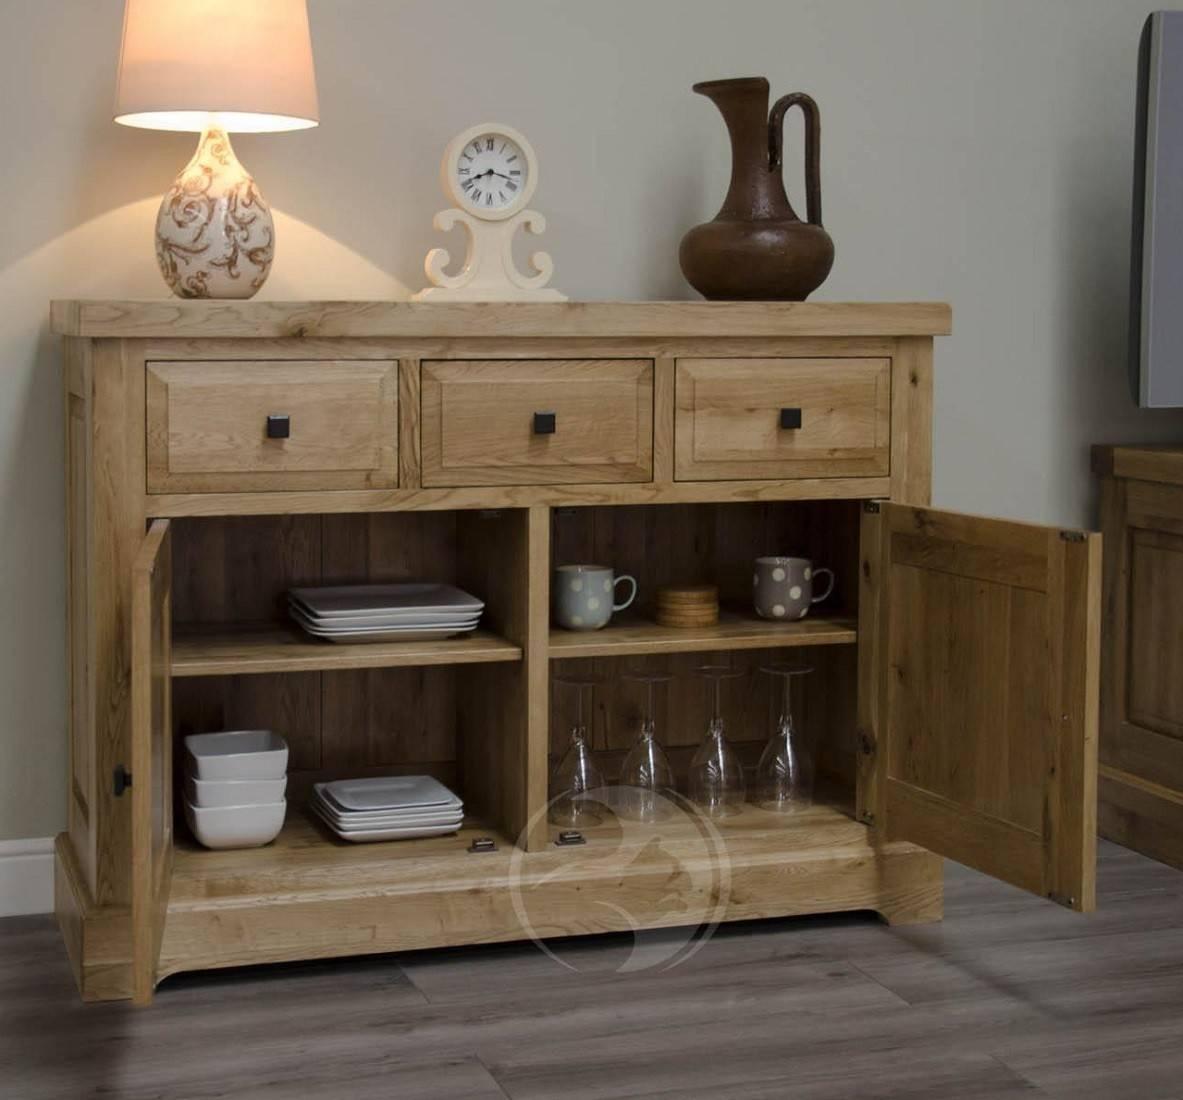 Coniston Rustic Solid Oak Medium Sideboard   Oak Furniture Uk Intended For Current Rustic Sideboard Furniture (View 15 of 15)